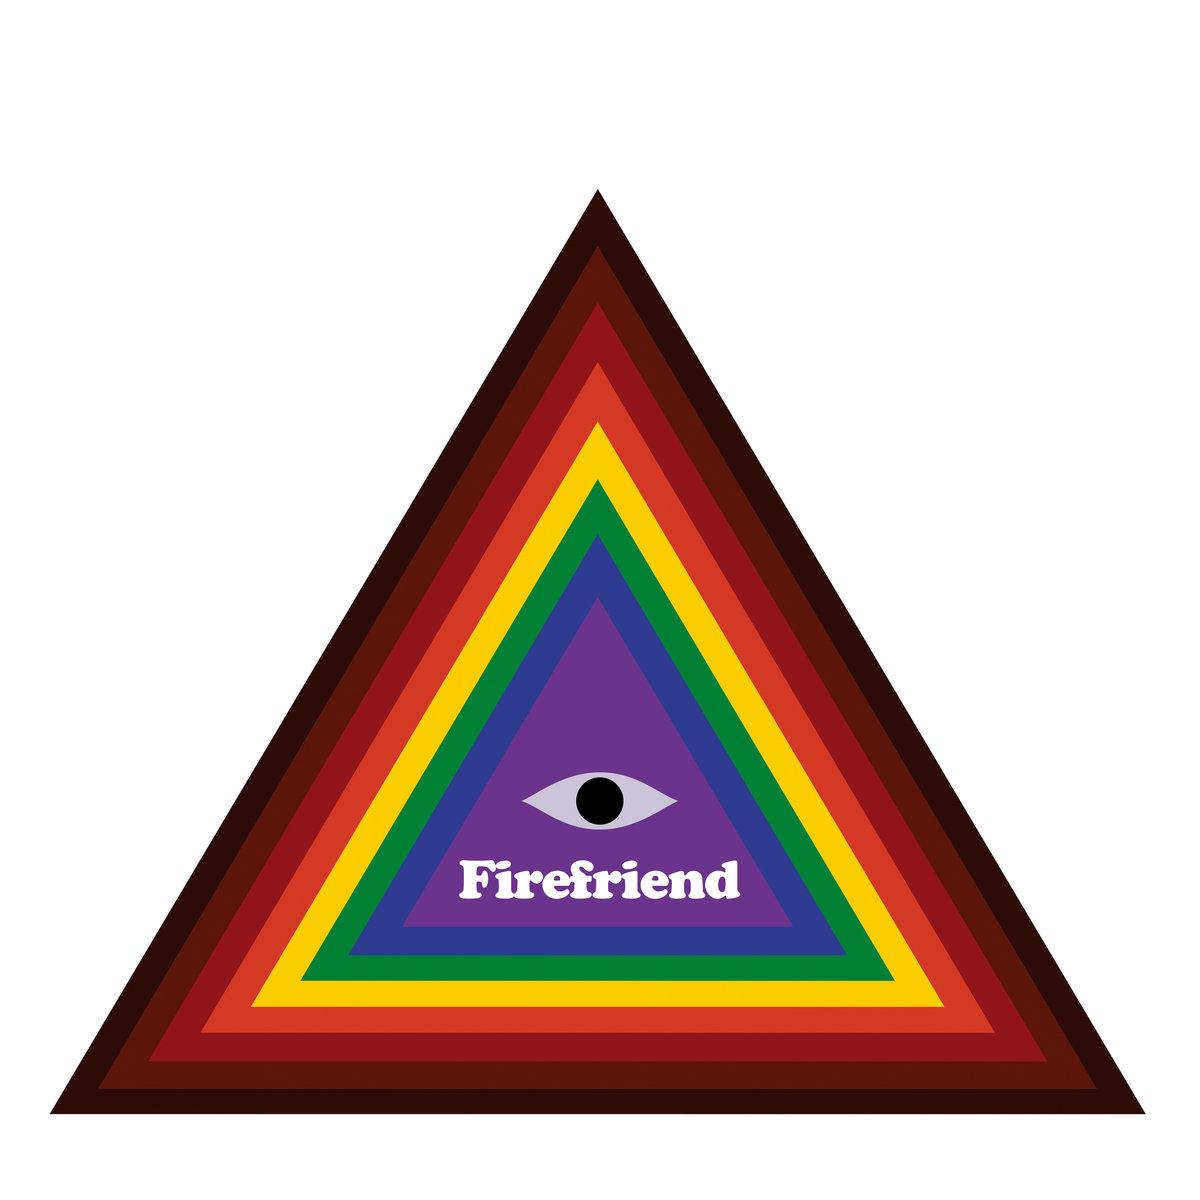 Firefriend - Dead Icons